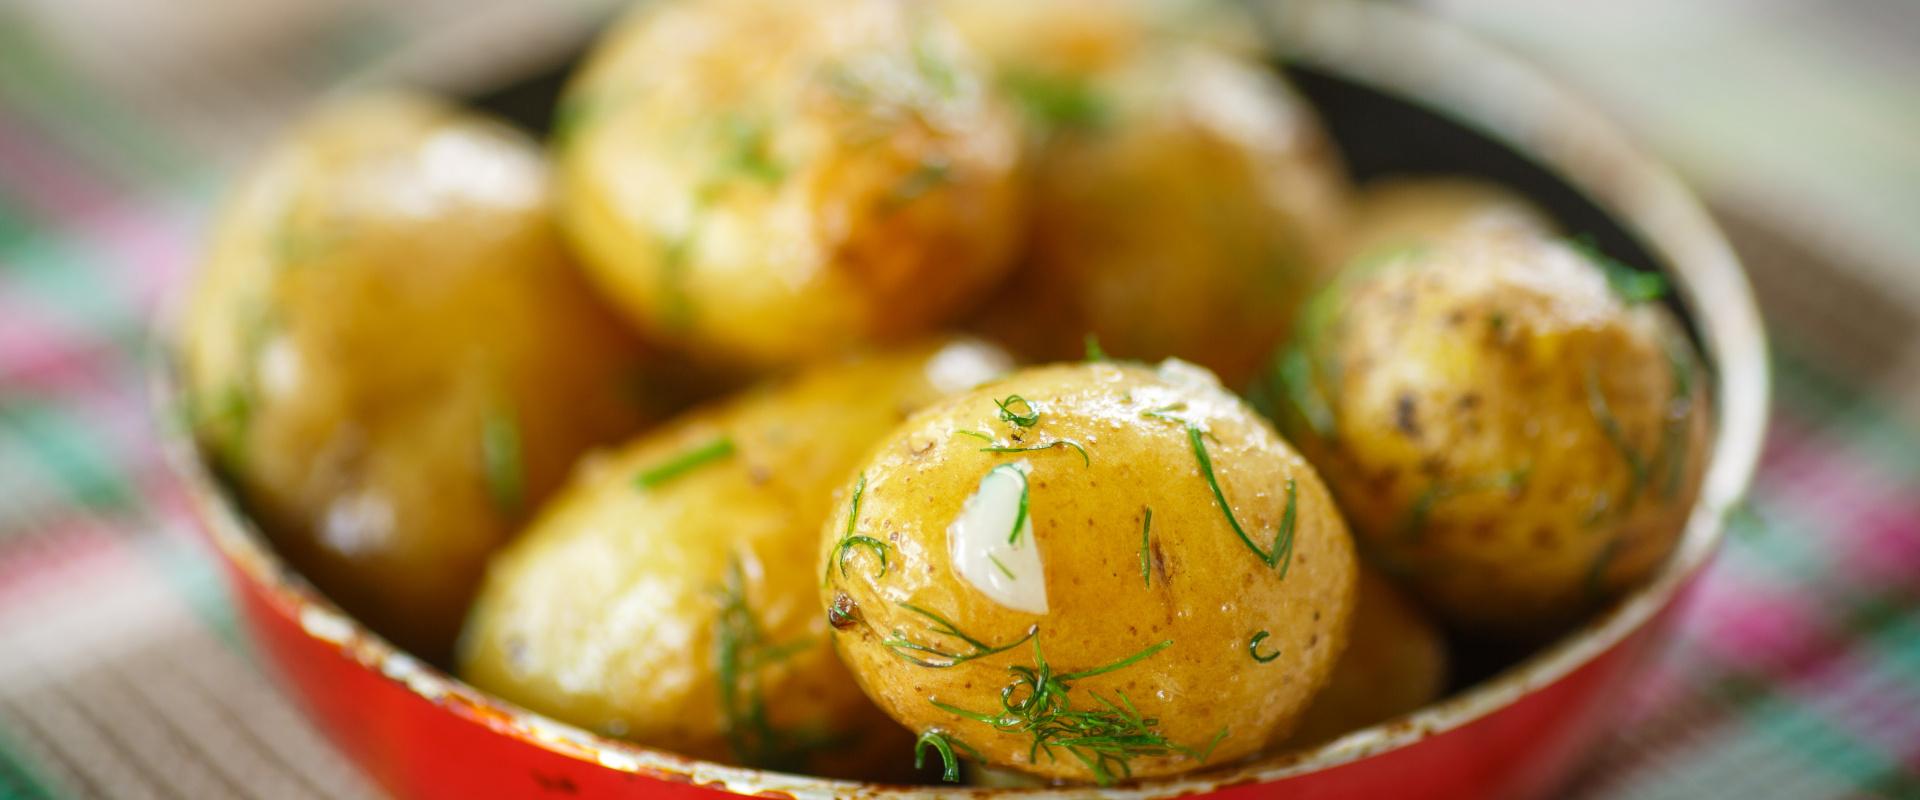 sült újkrumpli cover ok